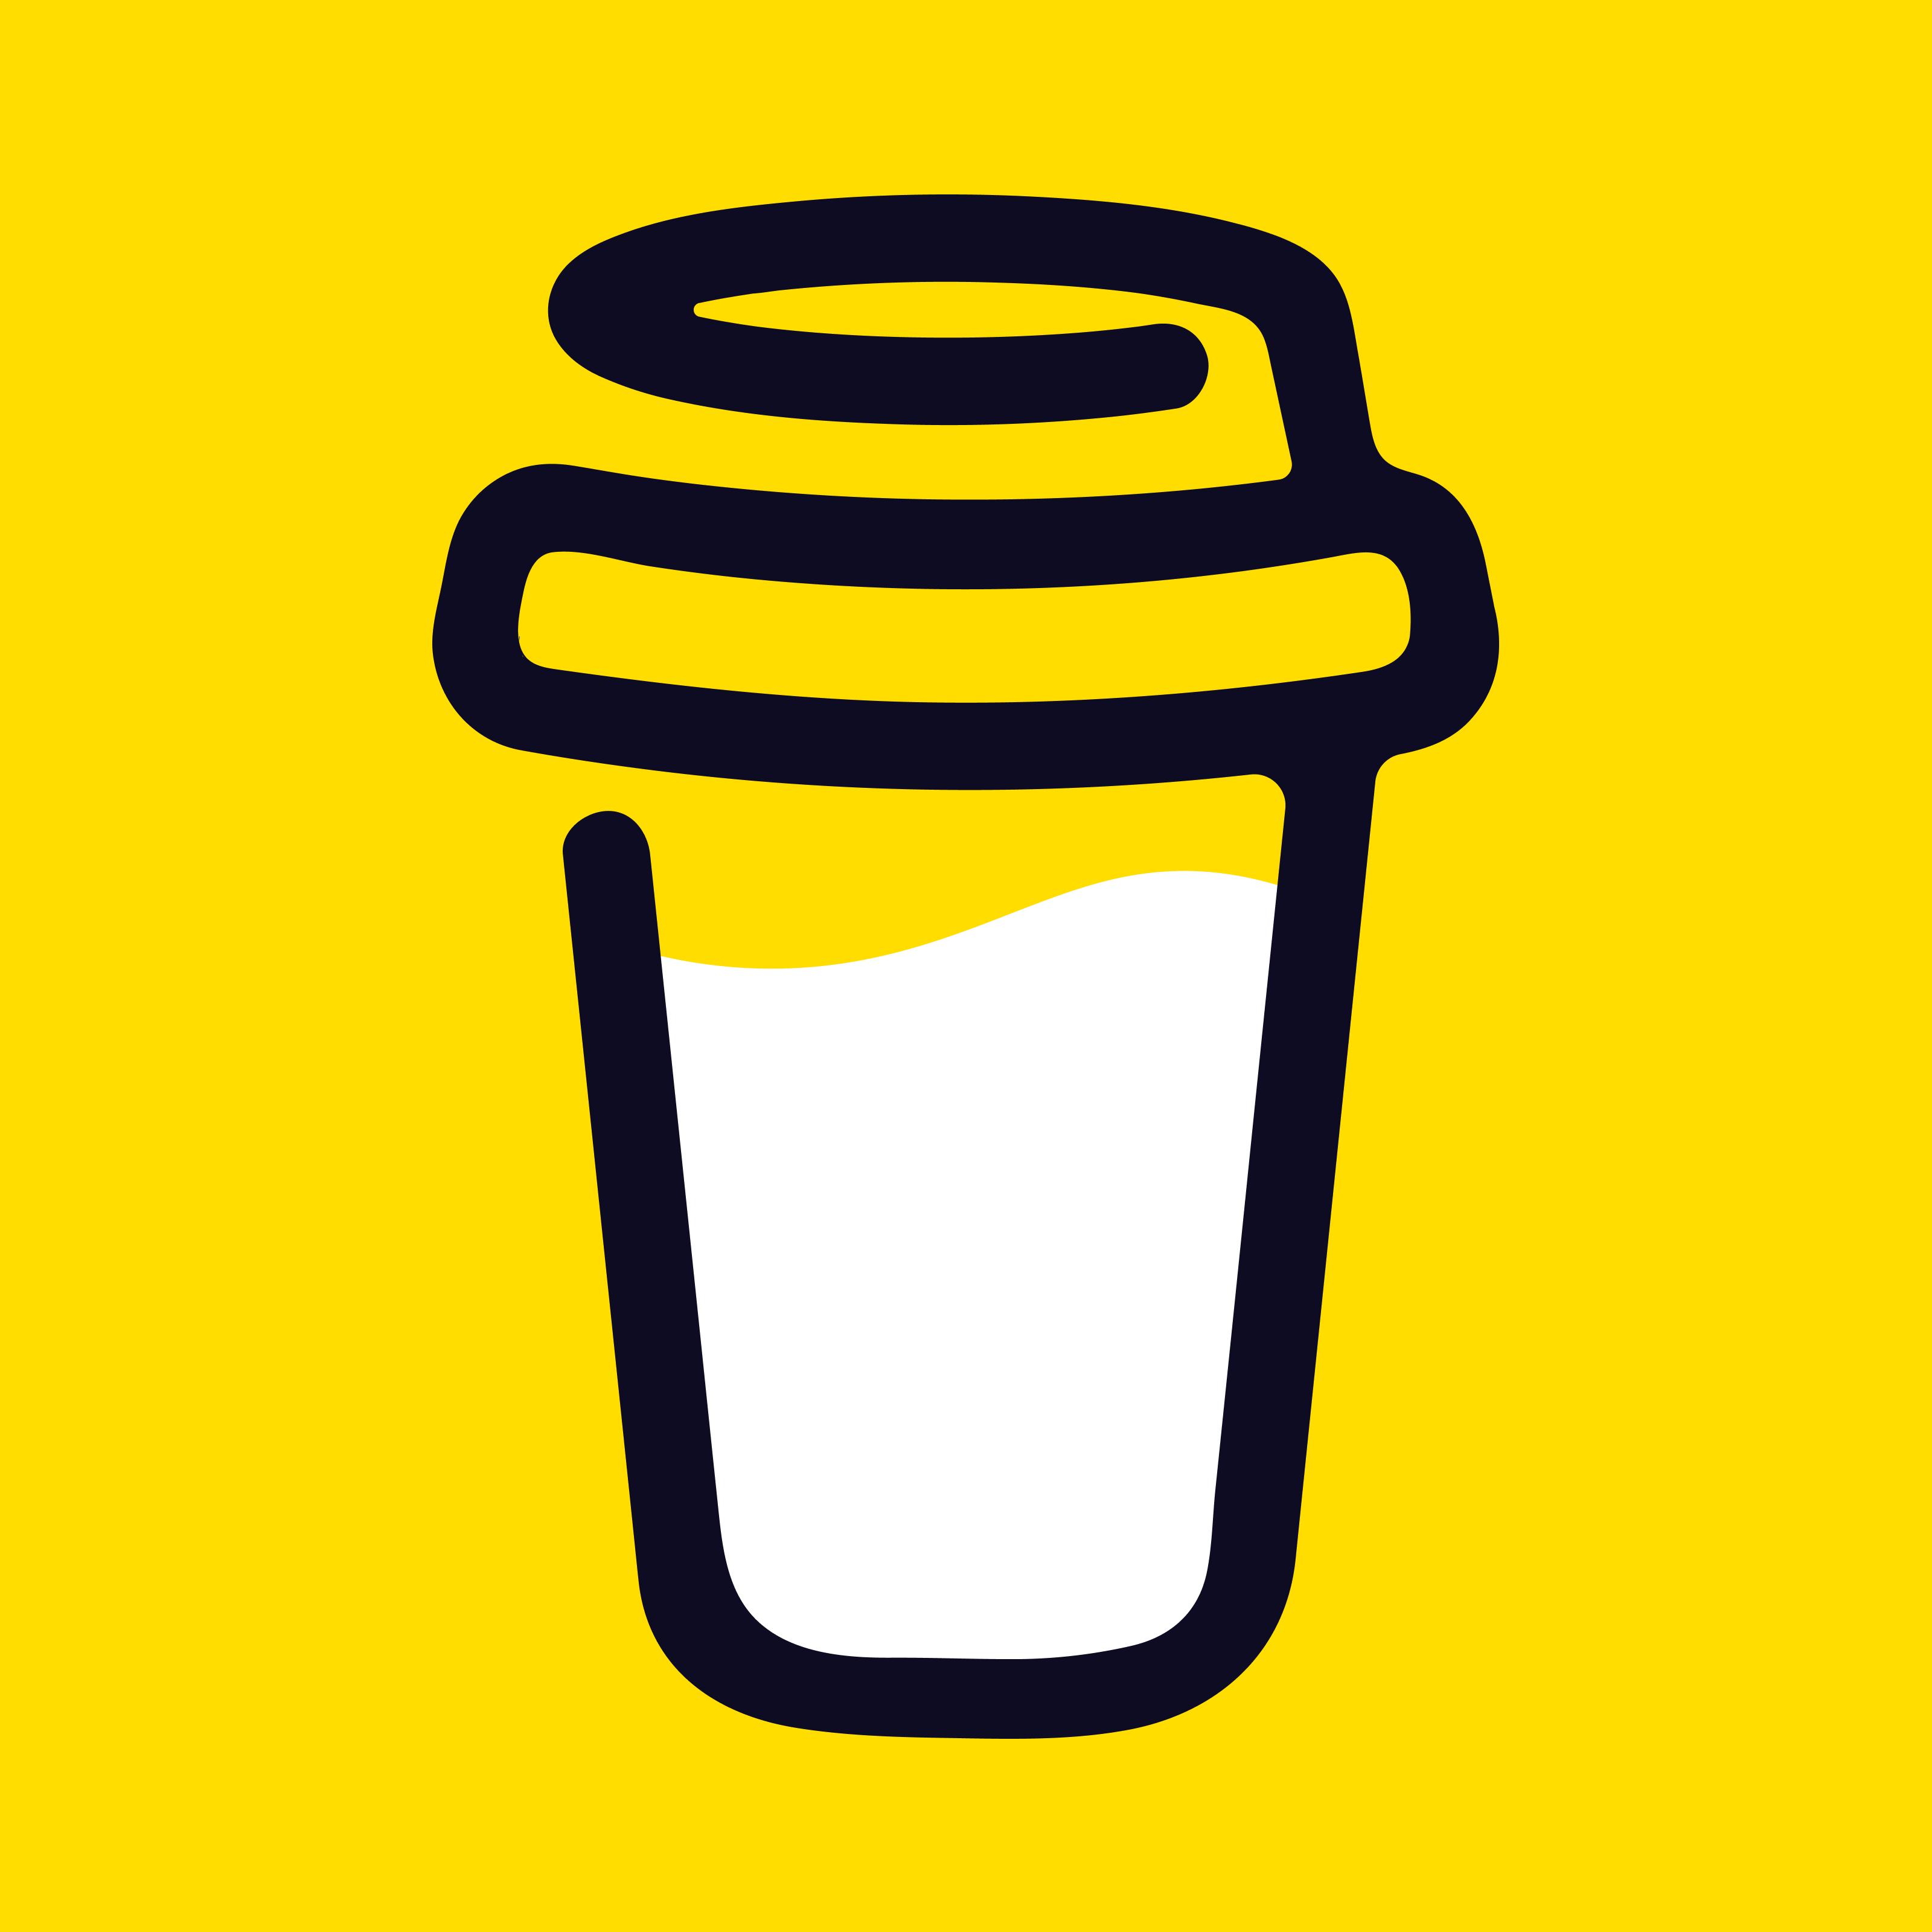 Bmc logo yellow